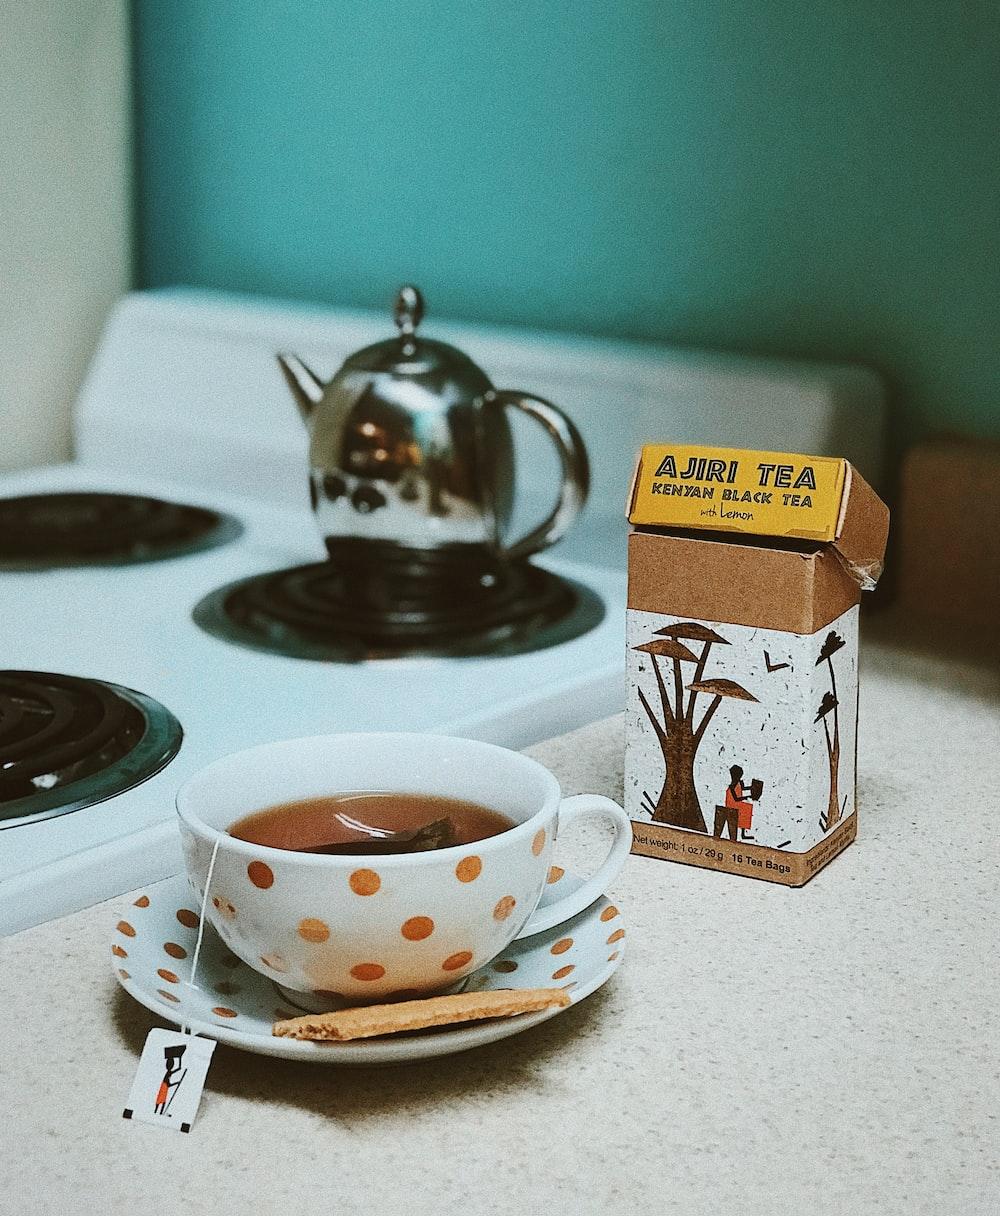 white and brown polka-dot ceramic teacup